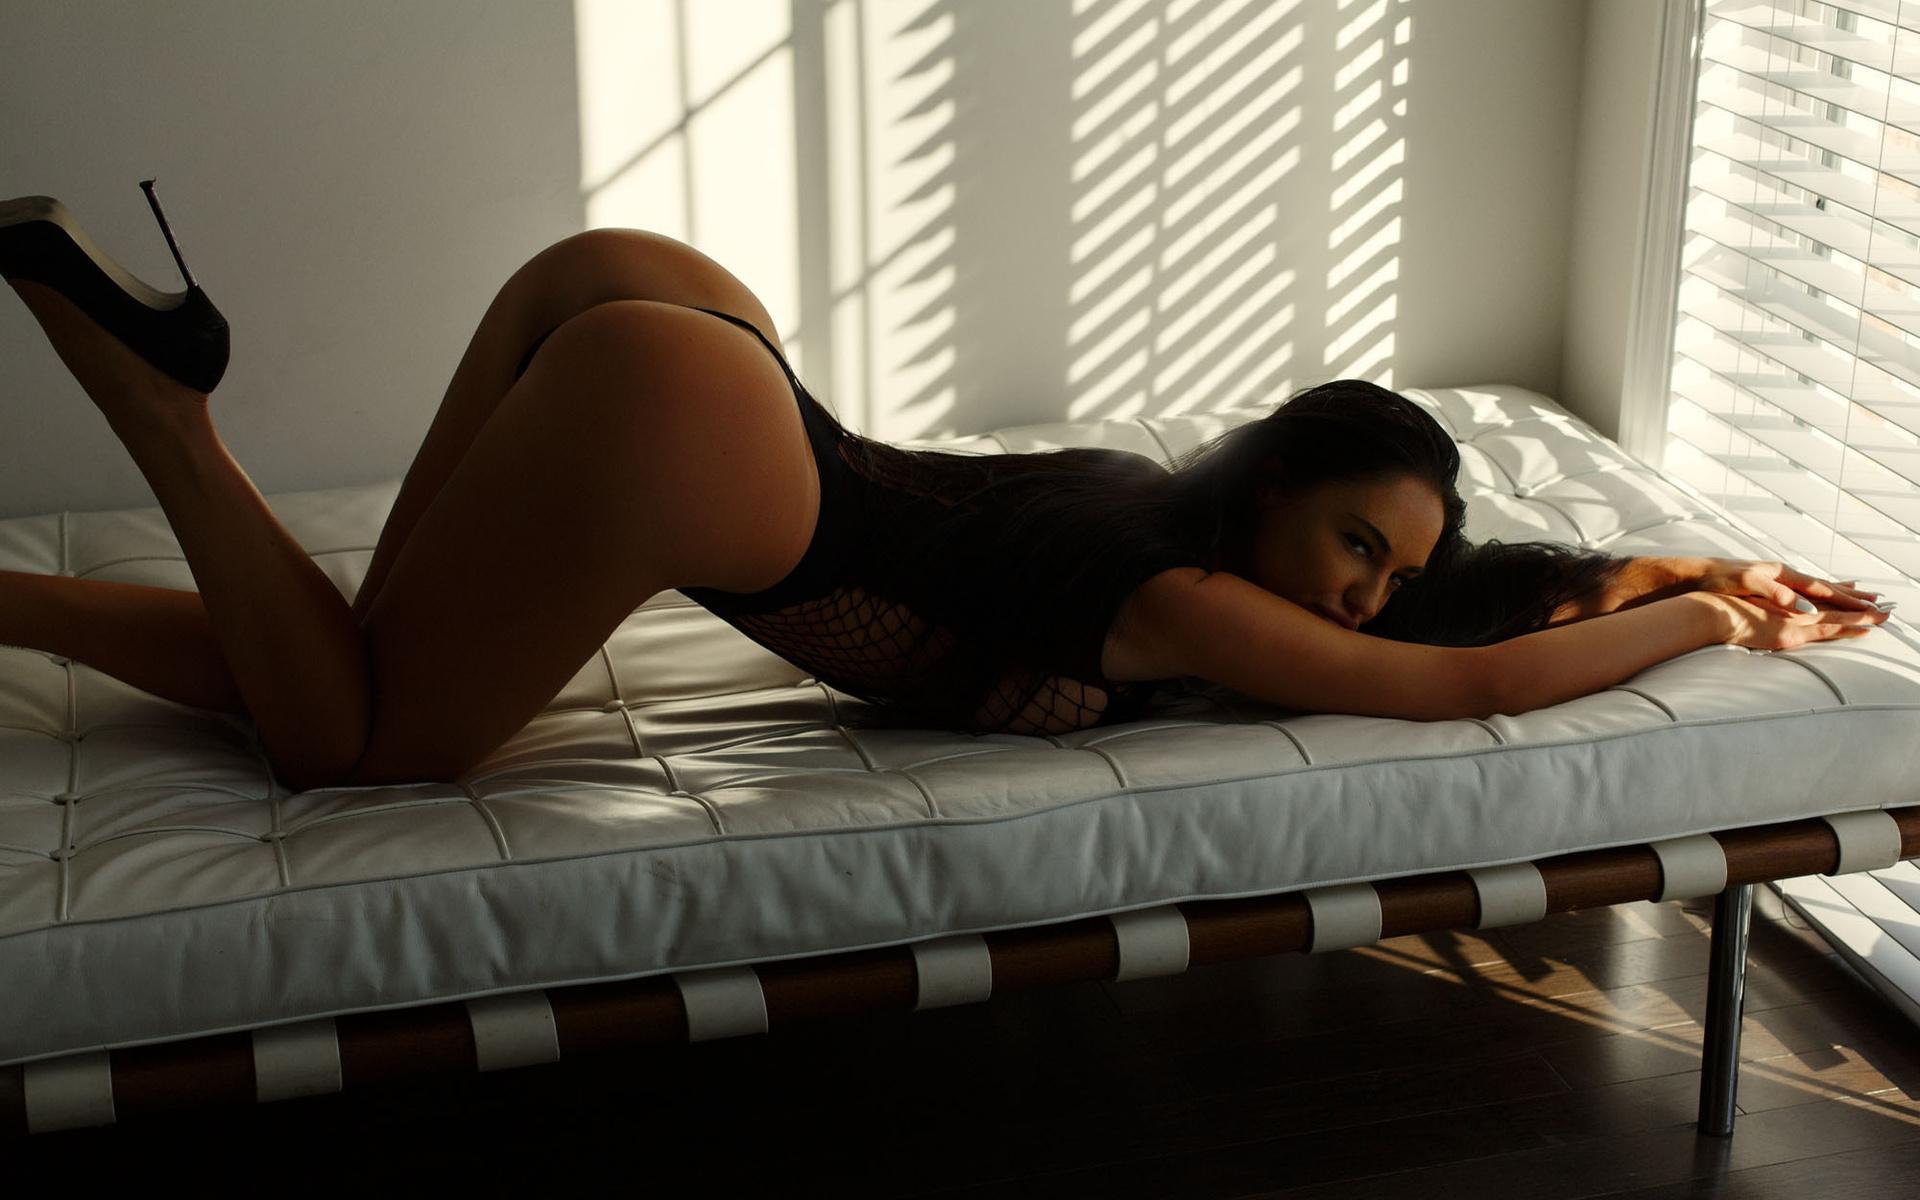 Телка в кровати — photo 11